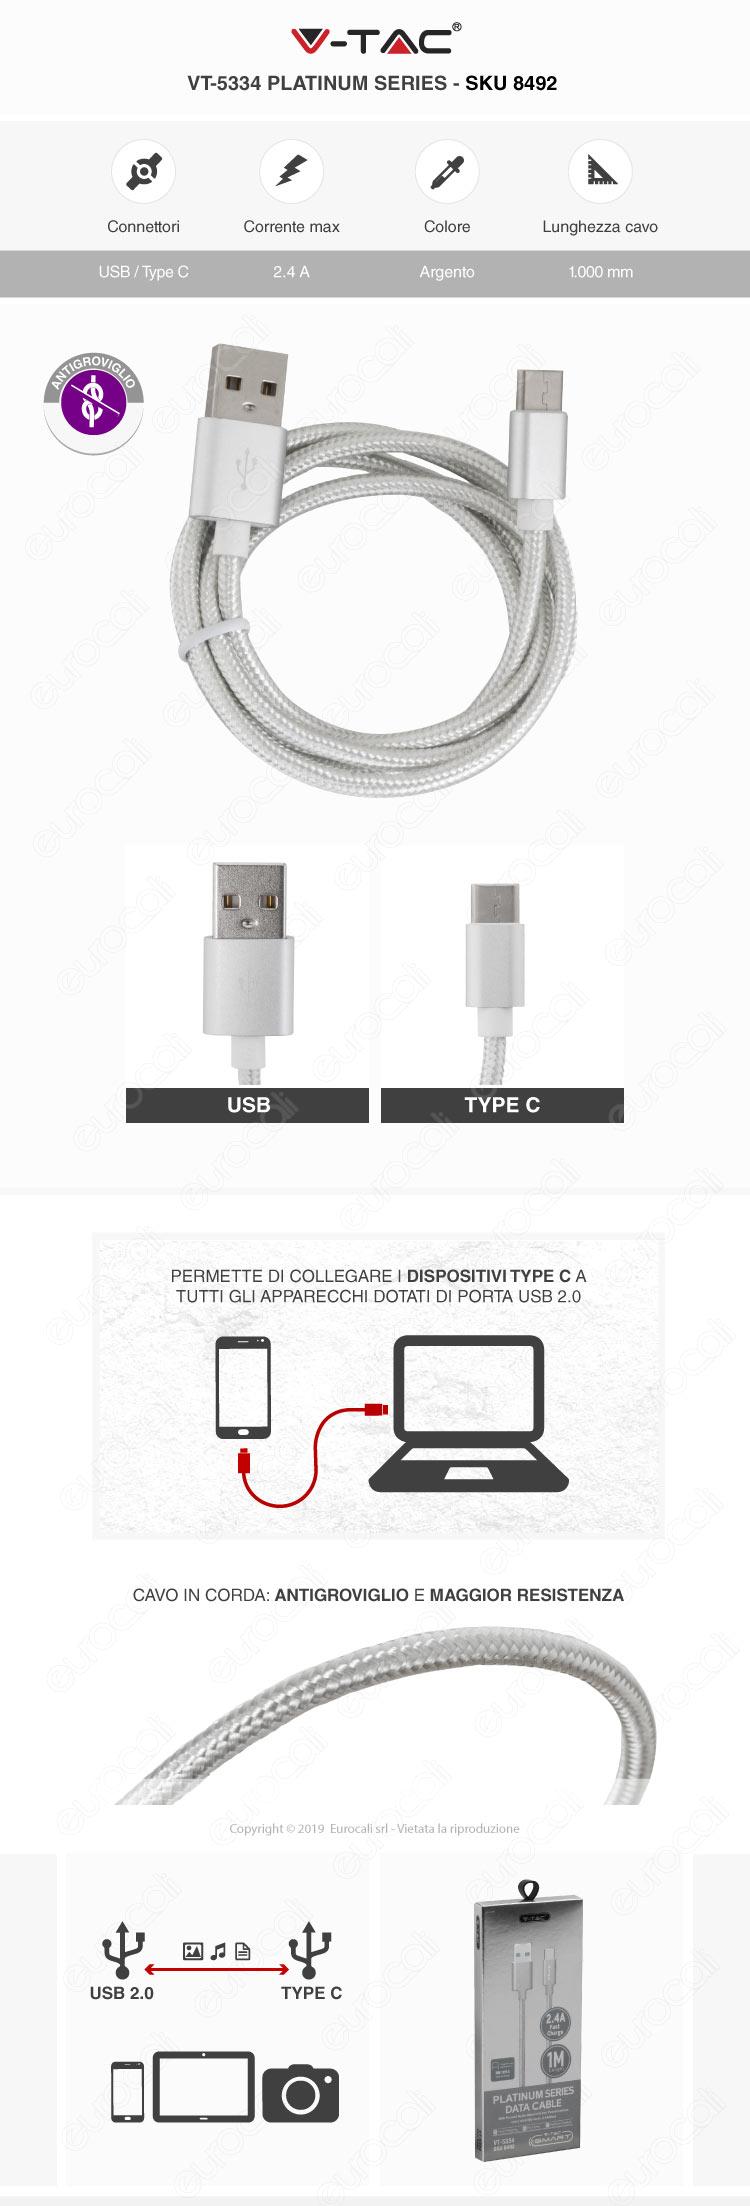 V-Tac VT-5334 platinum series USB Data Cable TYPE-C Cavo in corda Colore Argento 1m